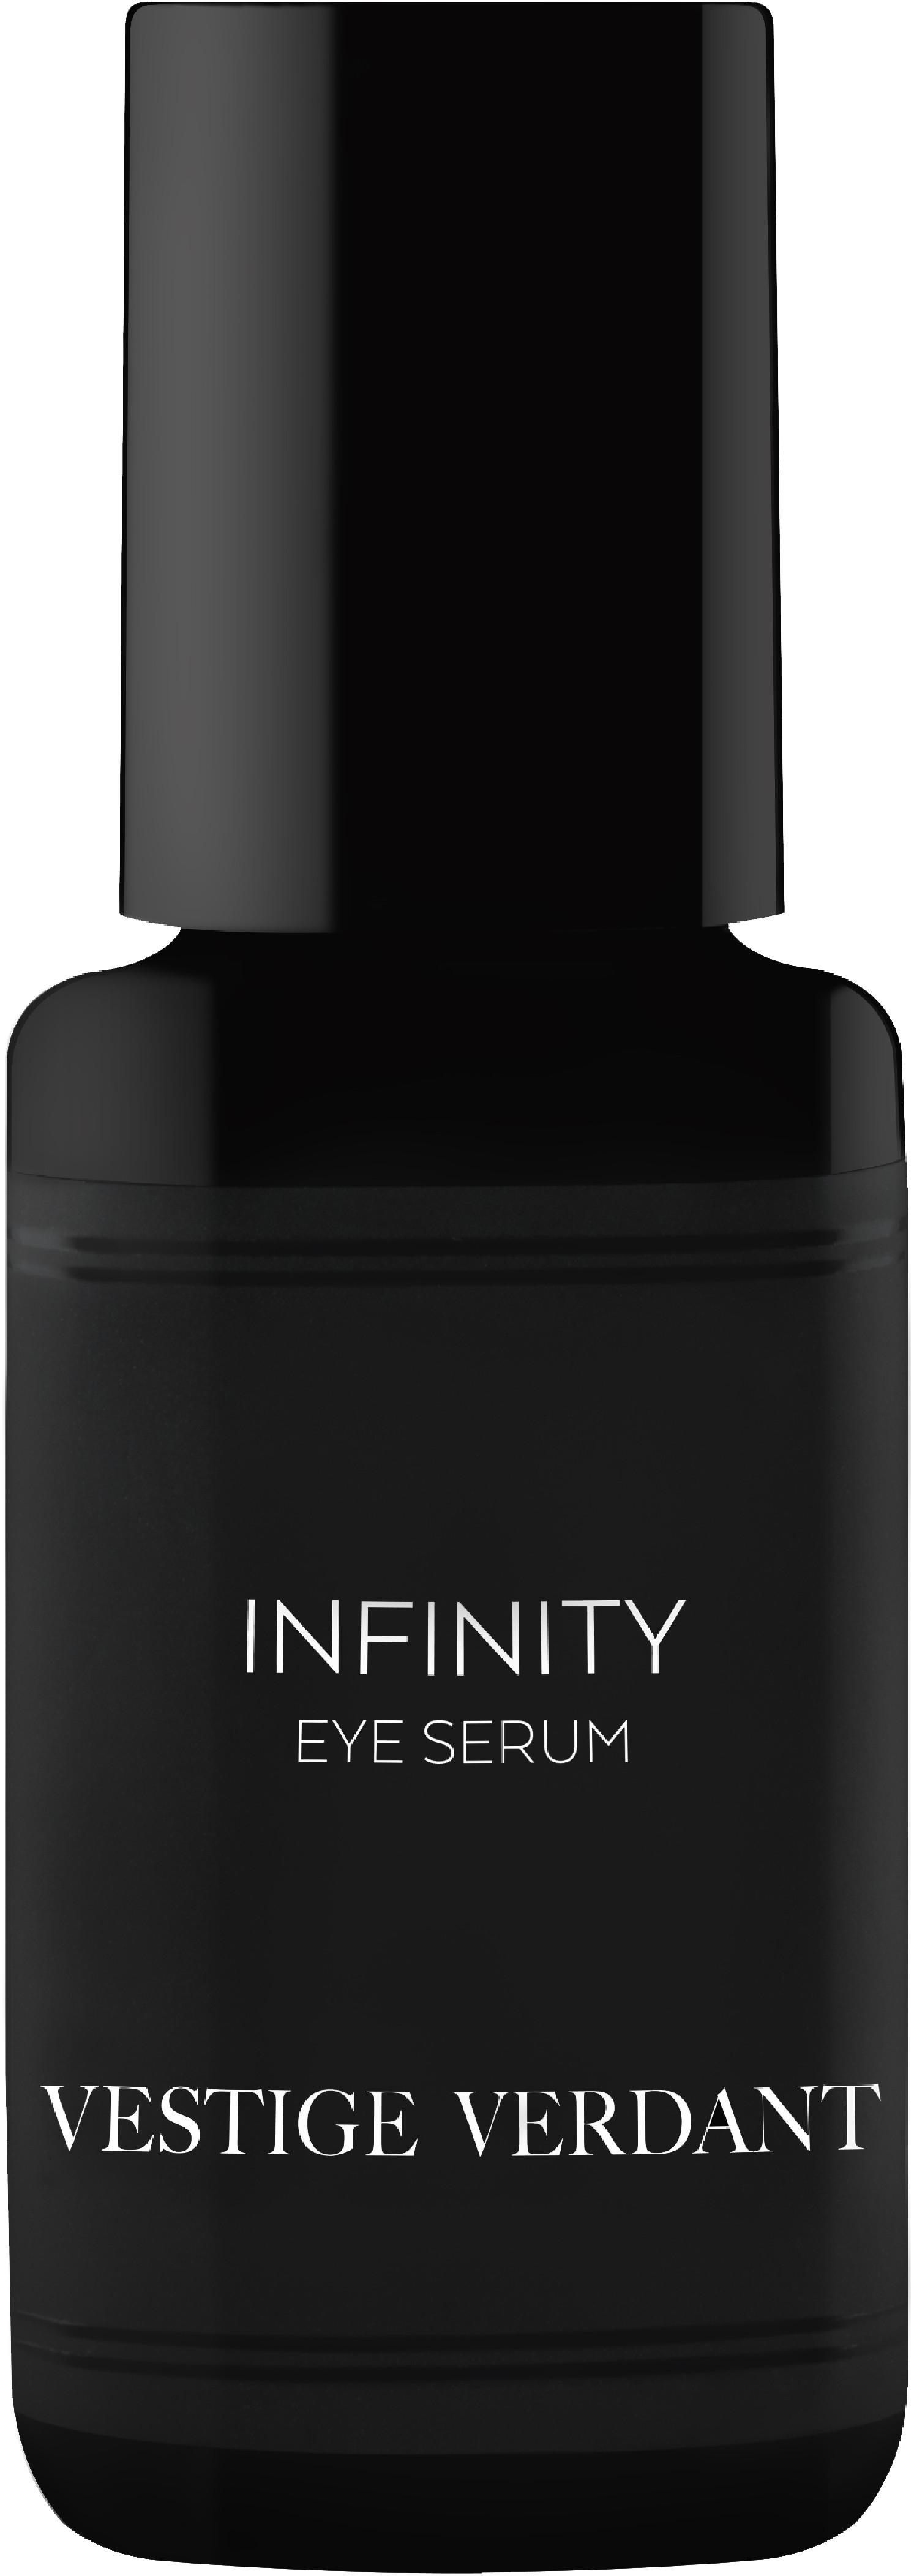 Vestige Verdant silmaseerum Infinity Eye Serum 20..